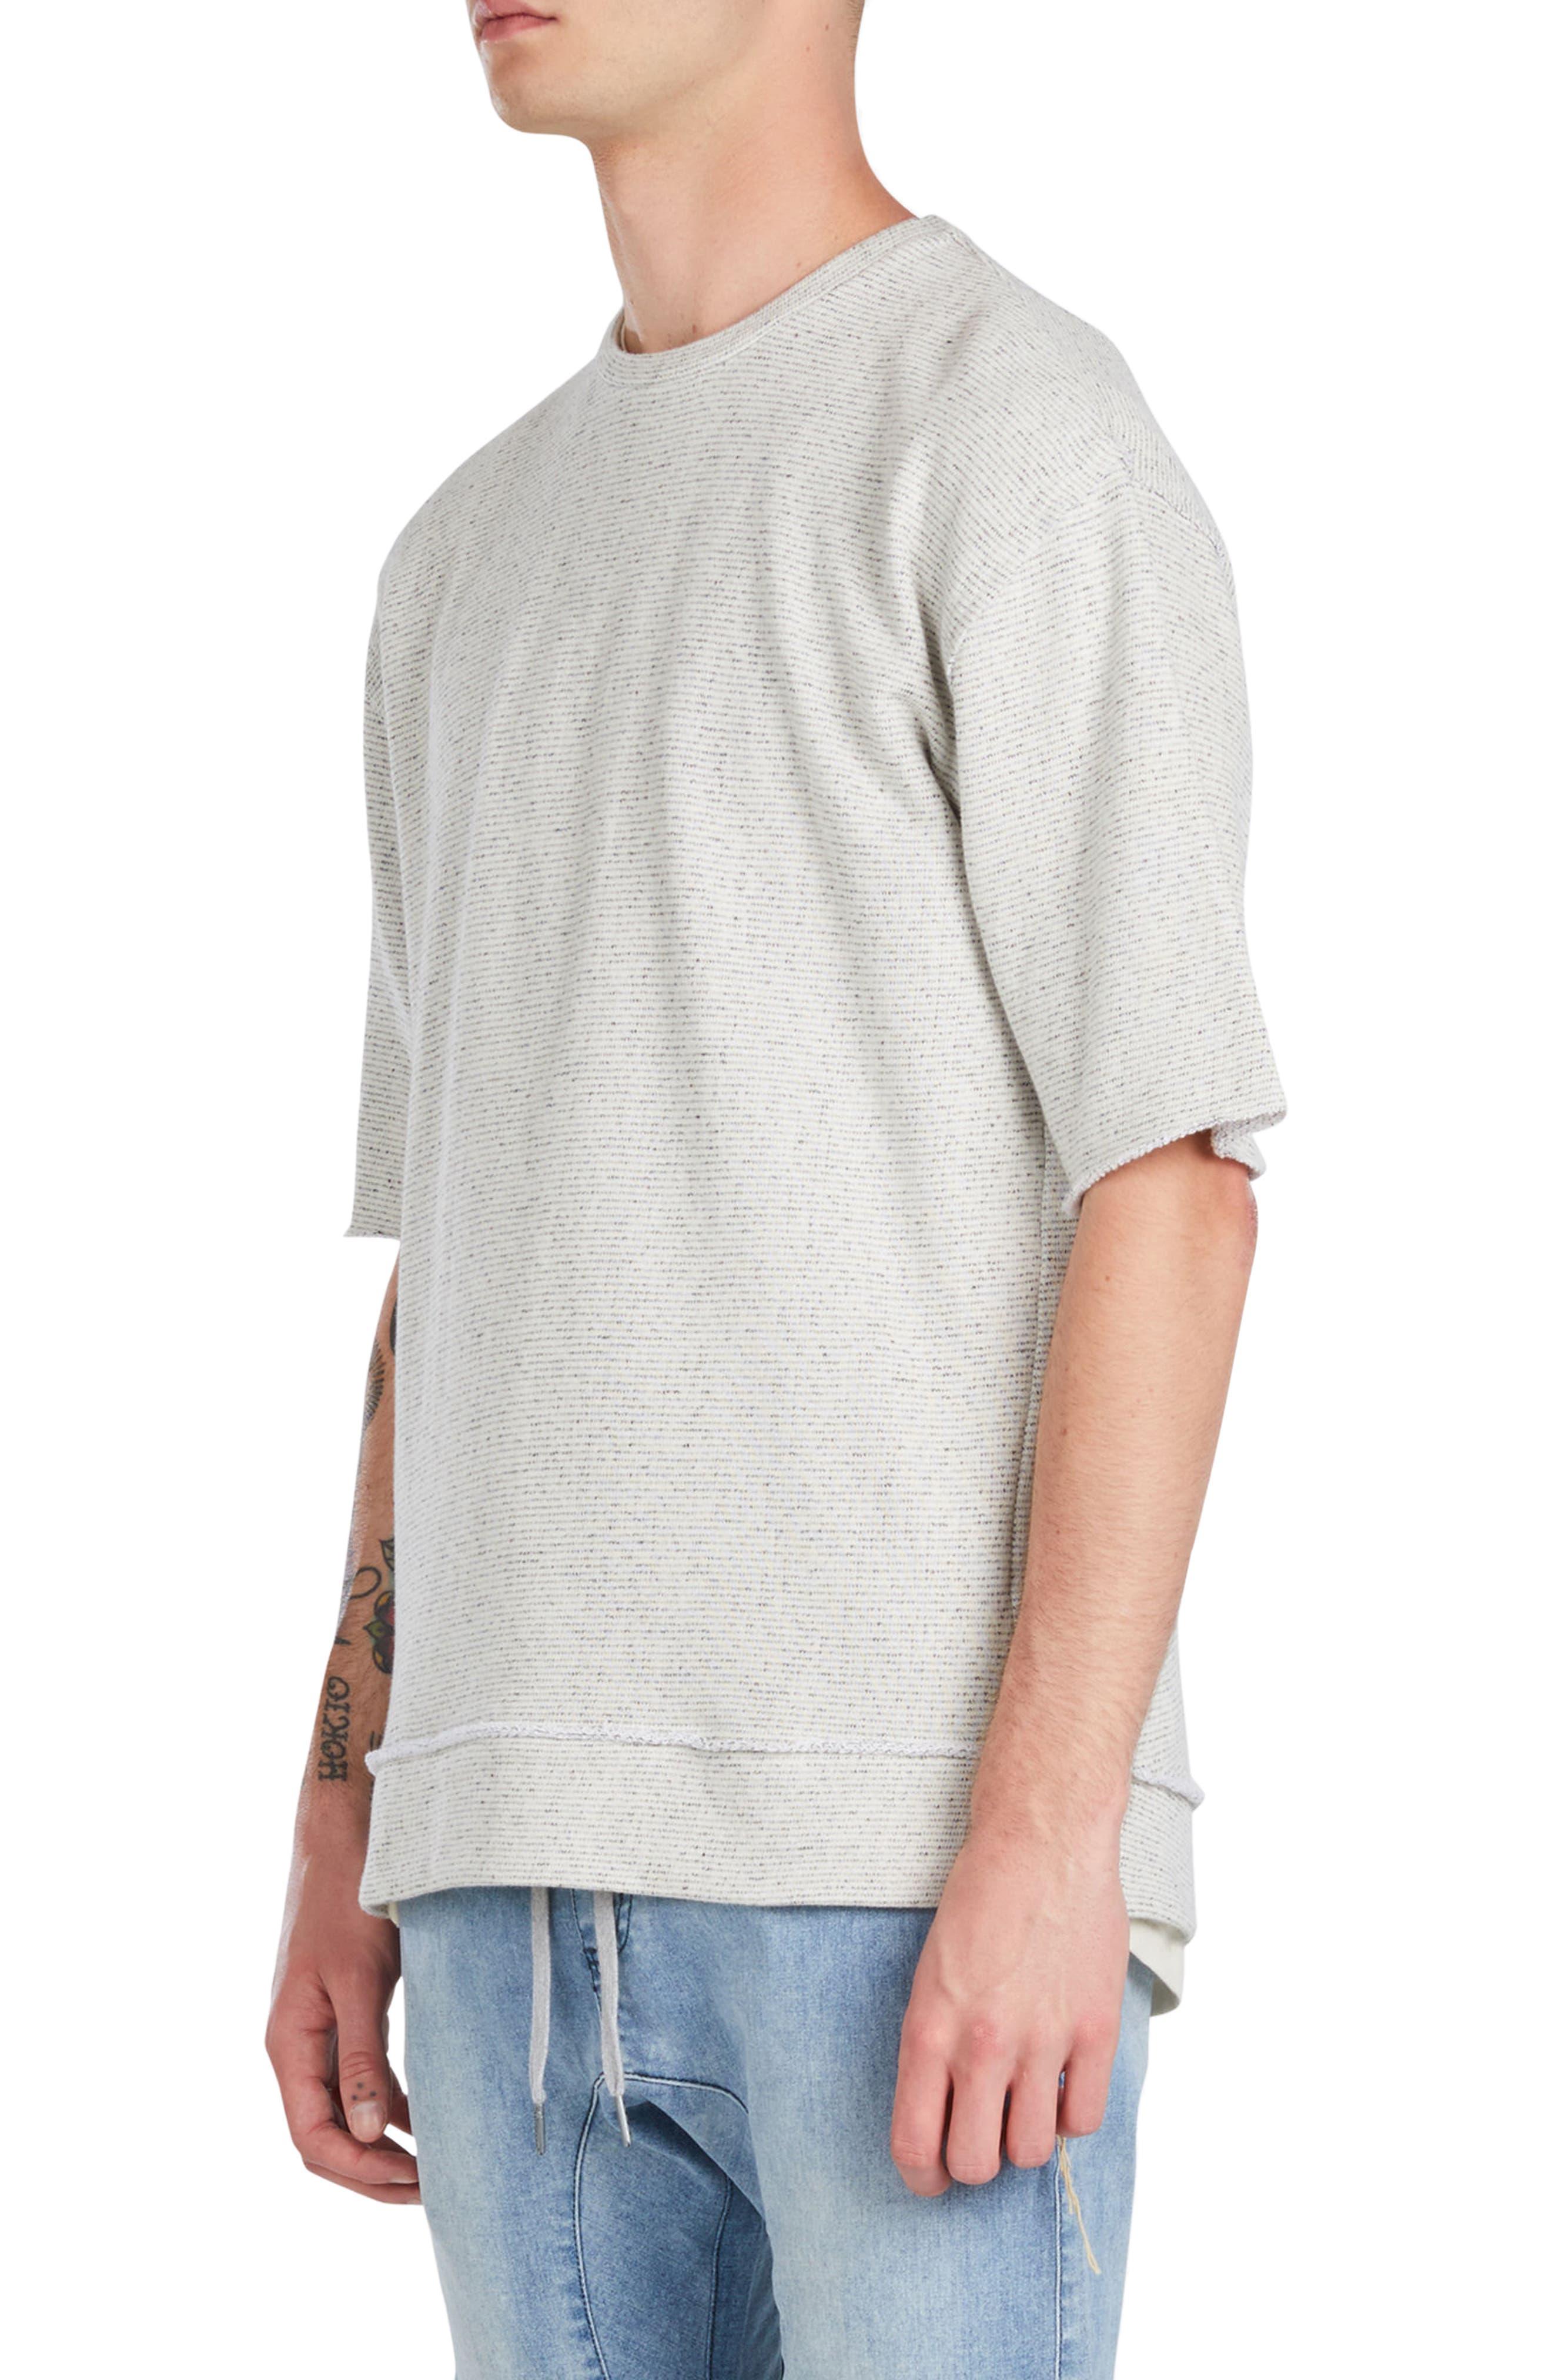 Rugger Oversize Half Sleeve Sweatshirt,                             Alternate thumbnail 3, color,                             251